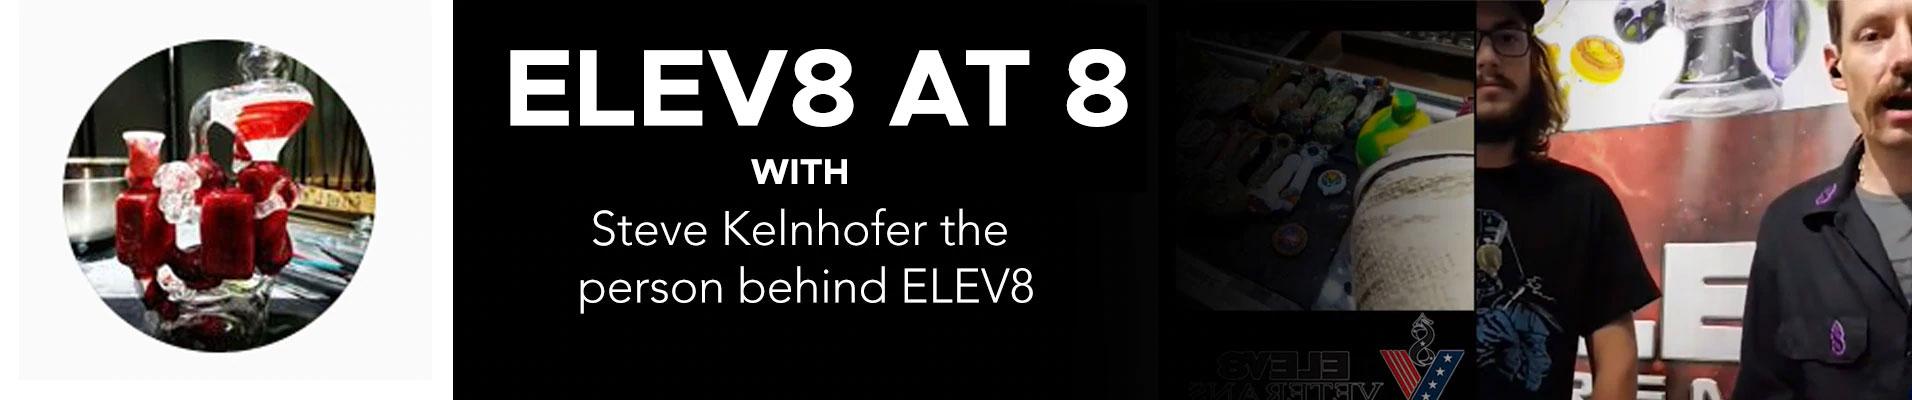 26-the-person-behind-eleb8.jpg